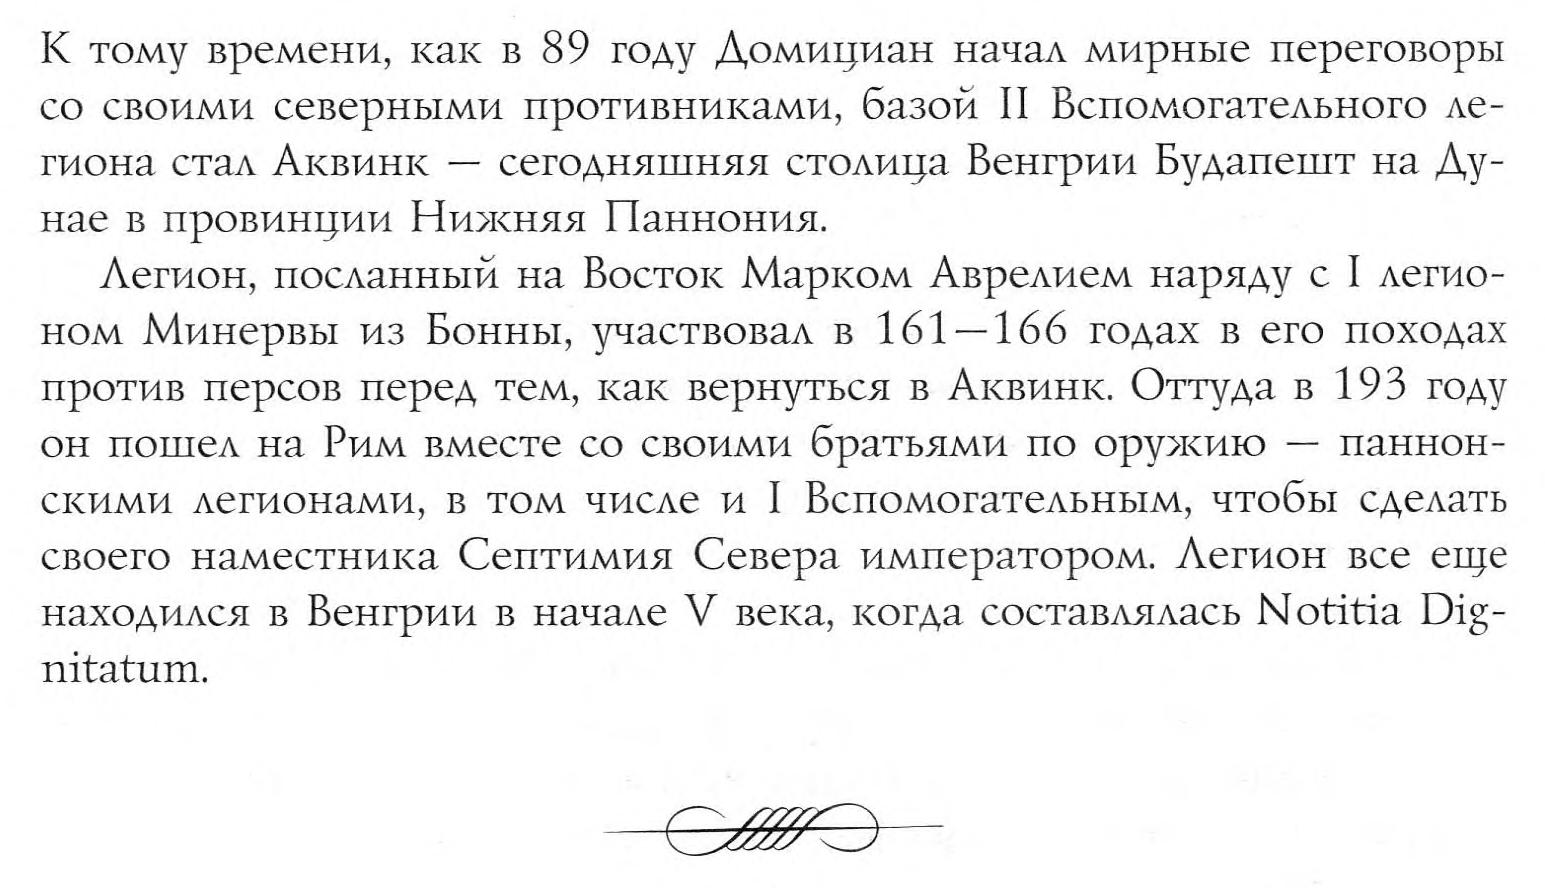 p0001